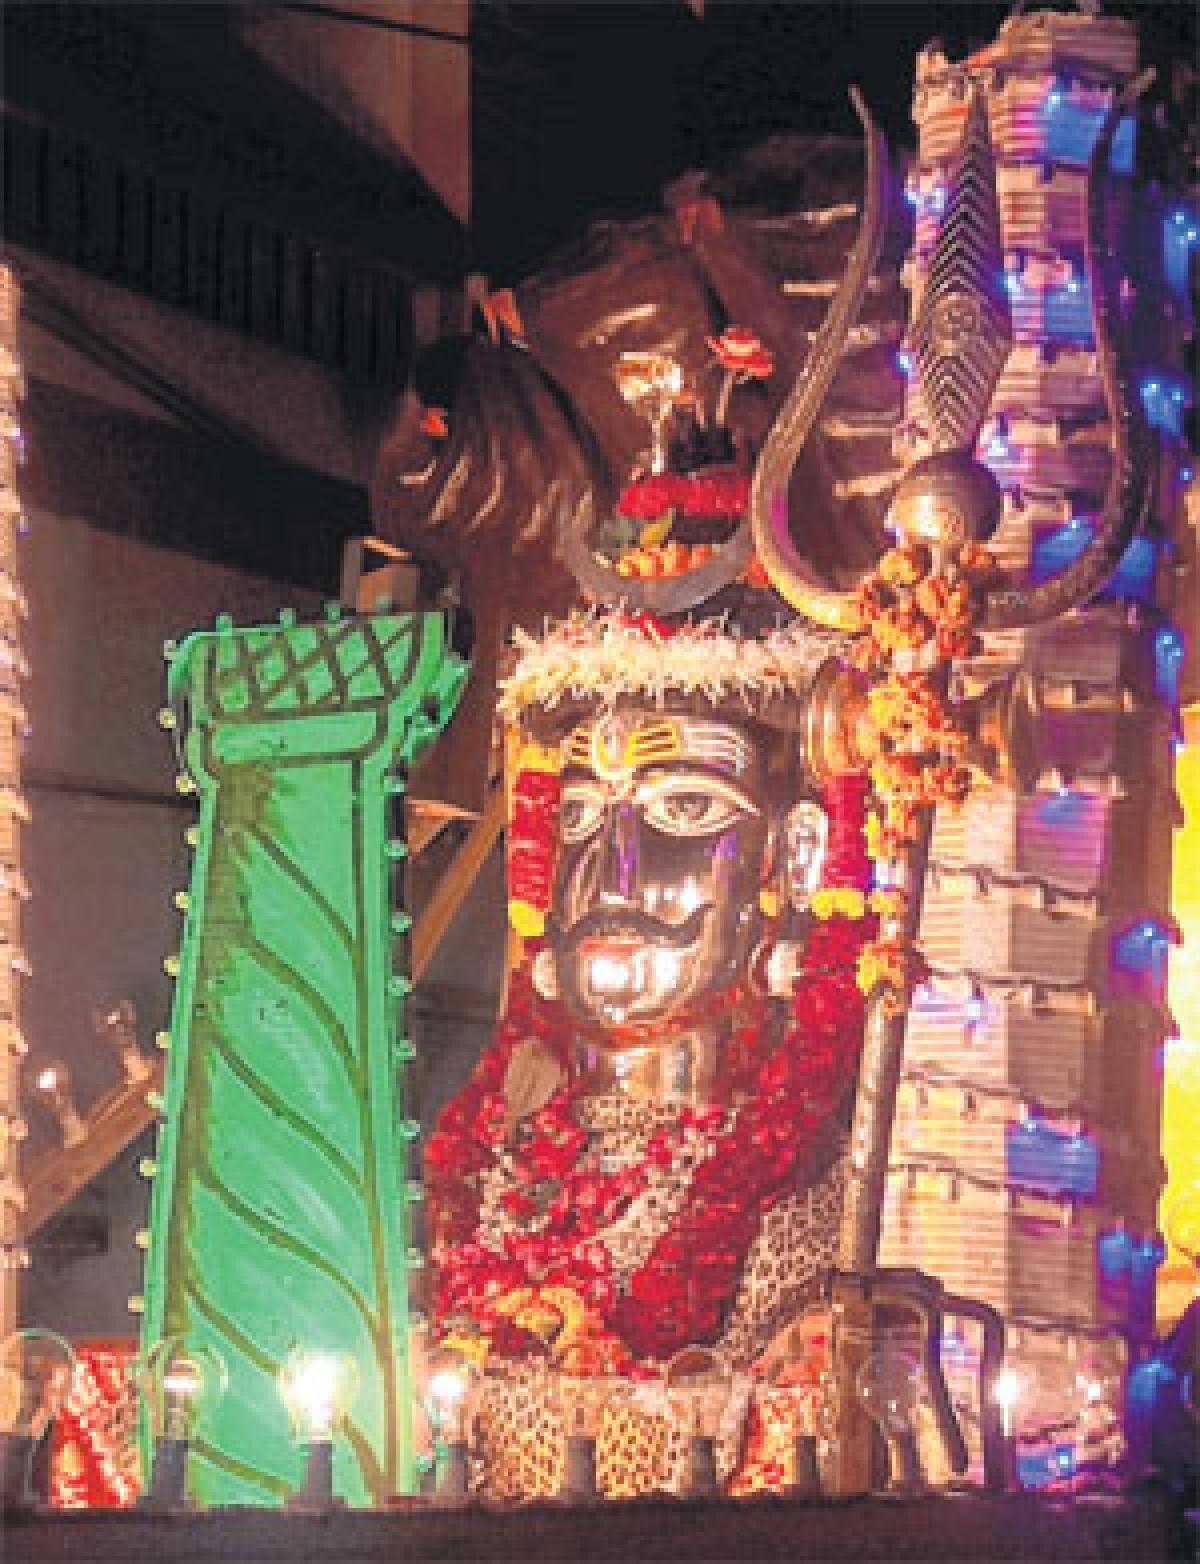 Ujjain: Century old musical tradition comes alive during Shravan